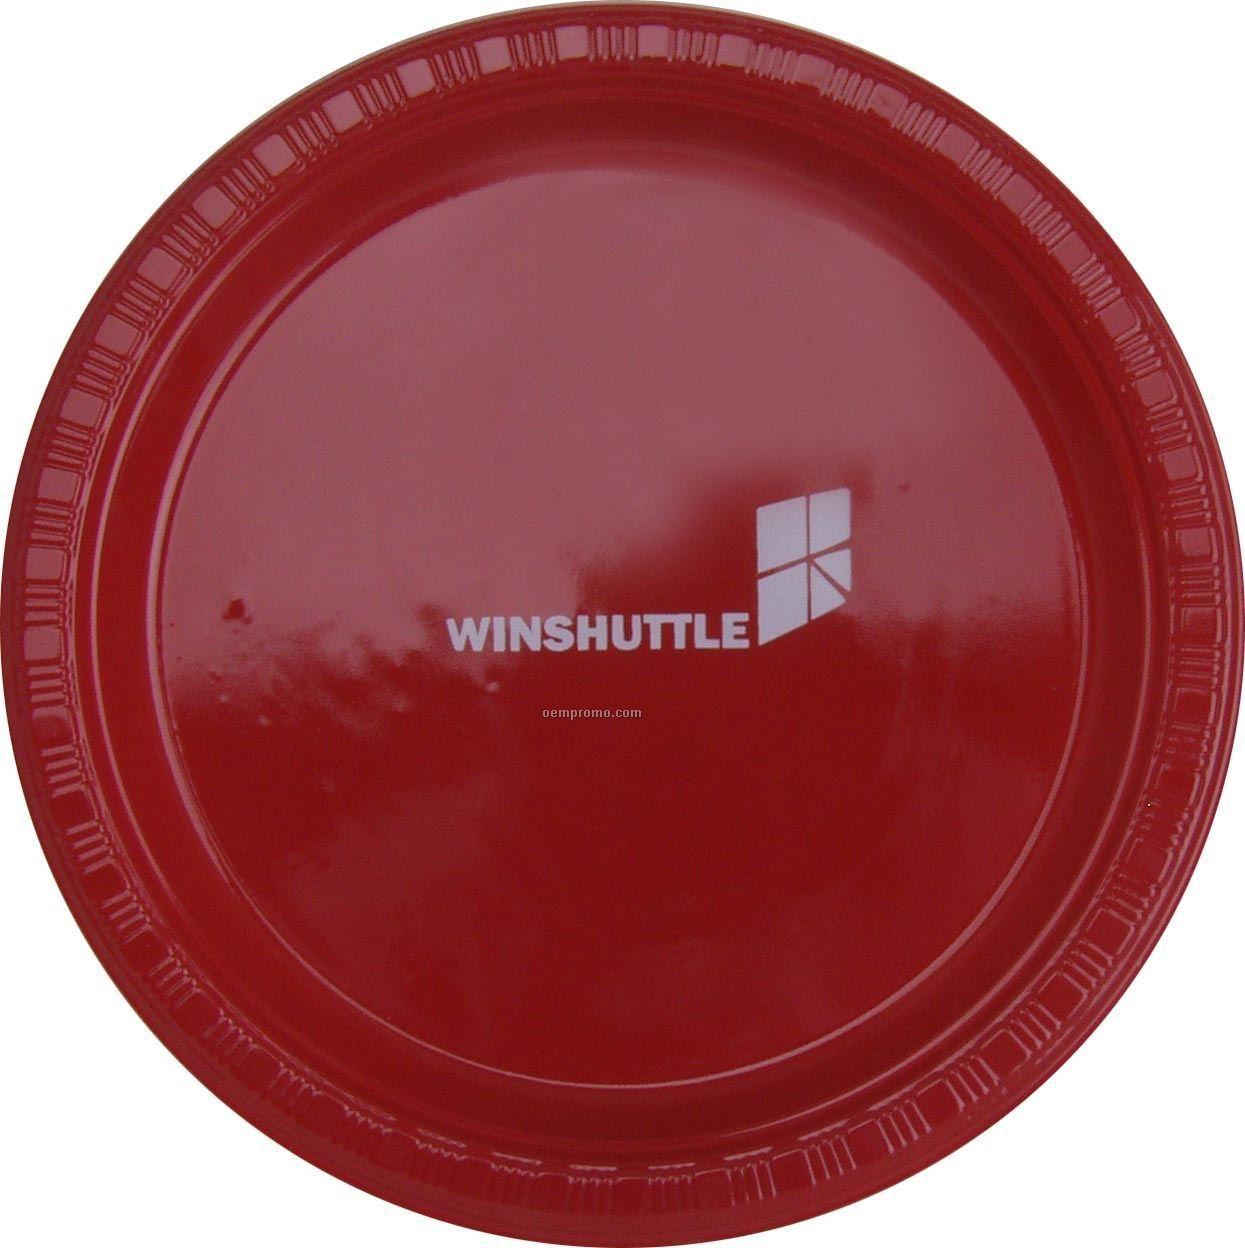 "Colorware 7"" Classic Red Plastic Plate"